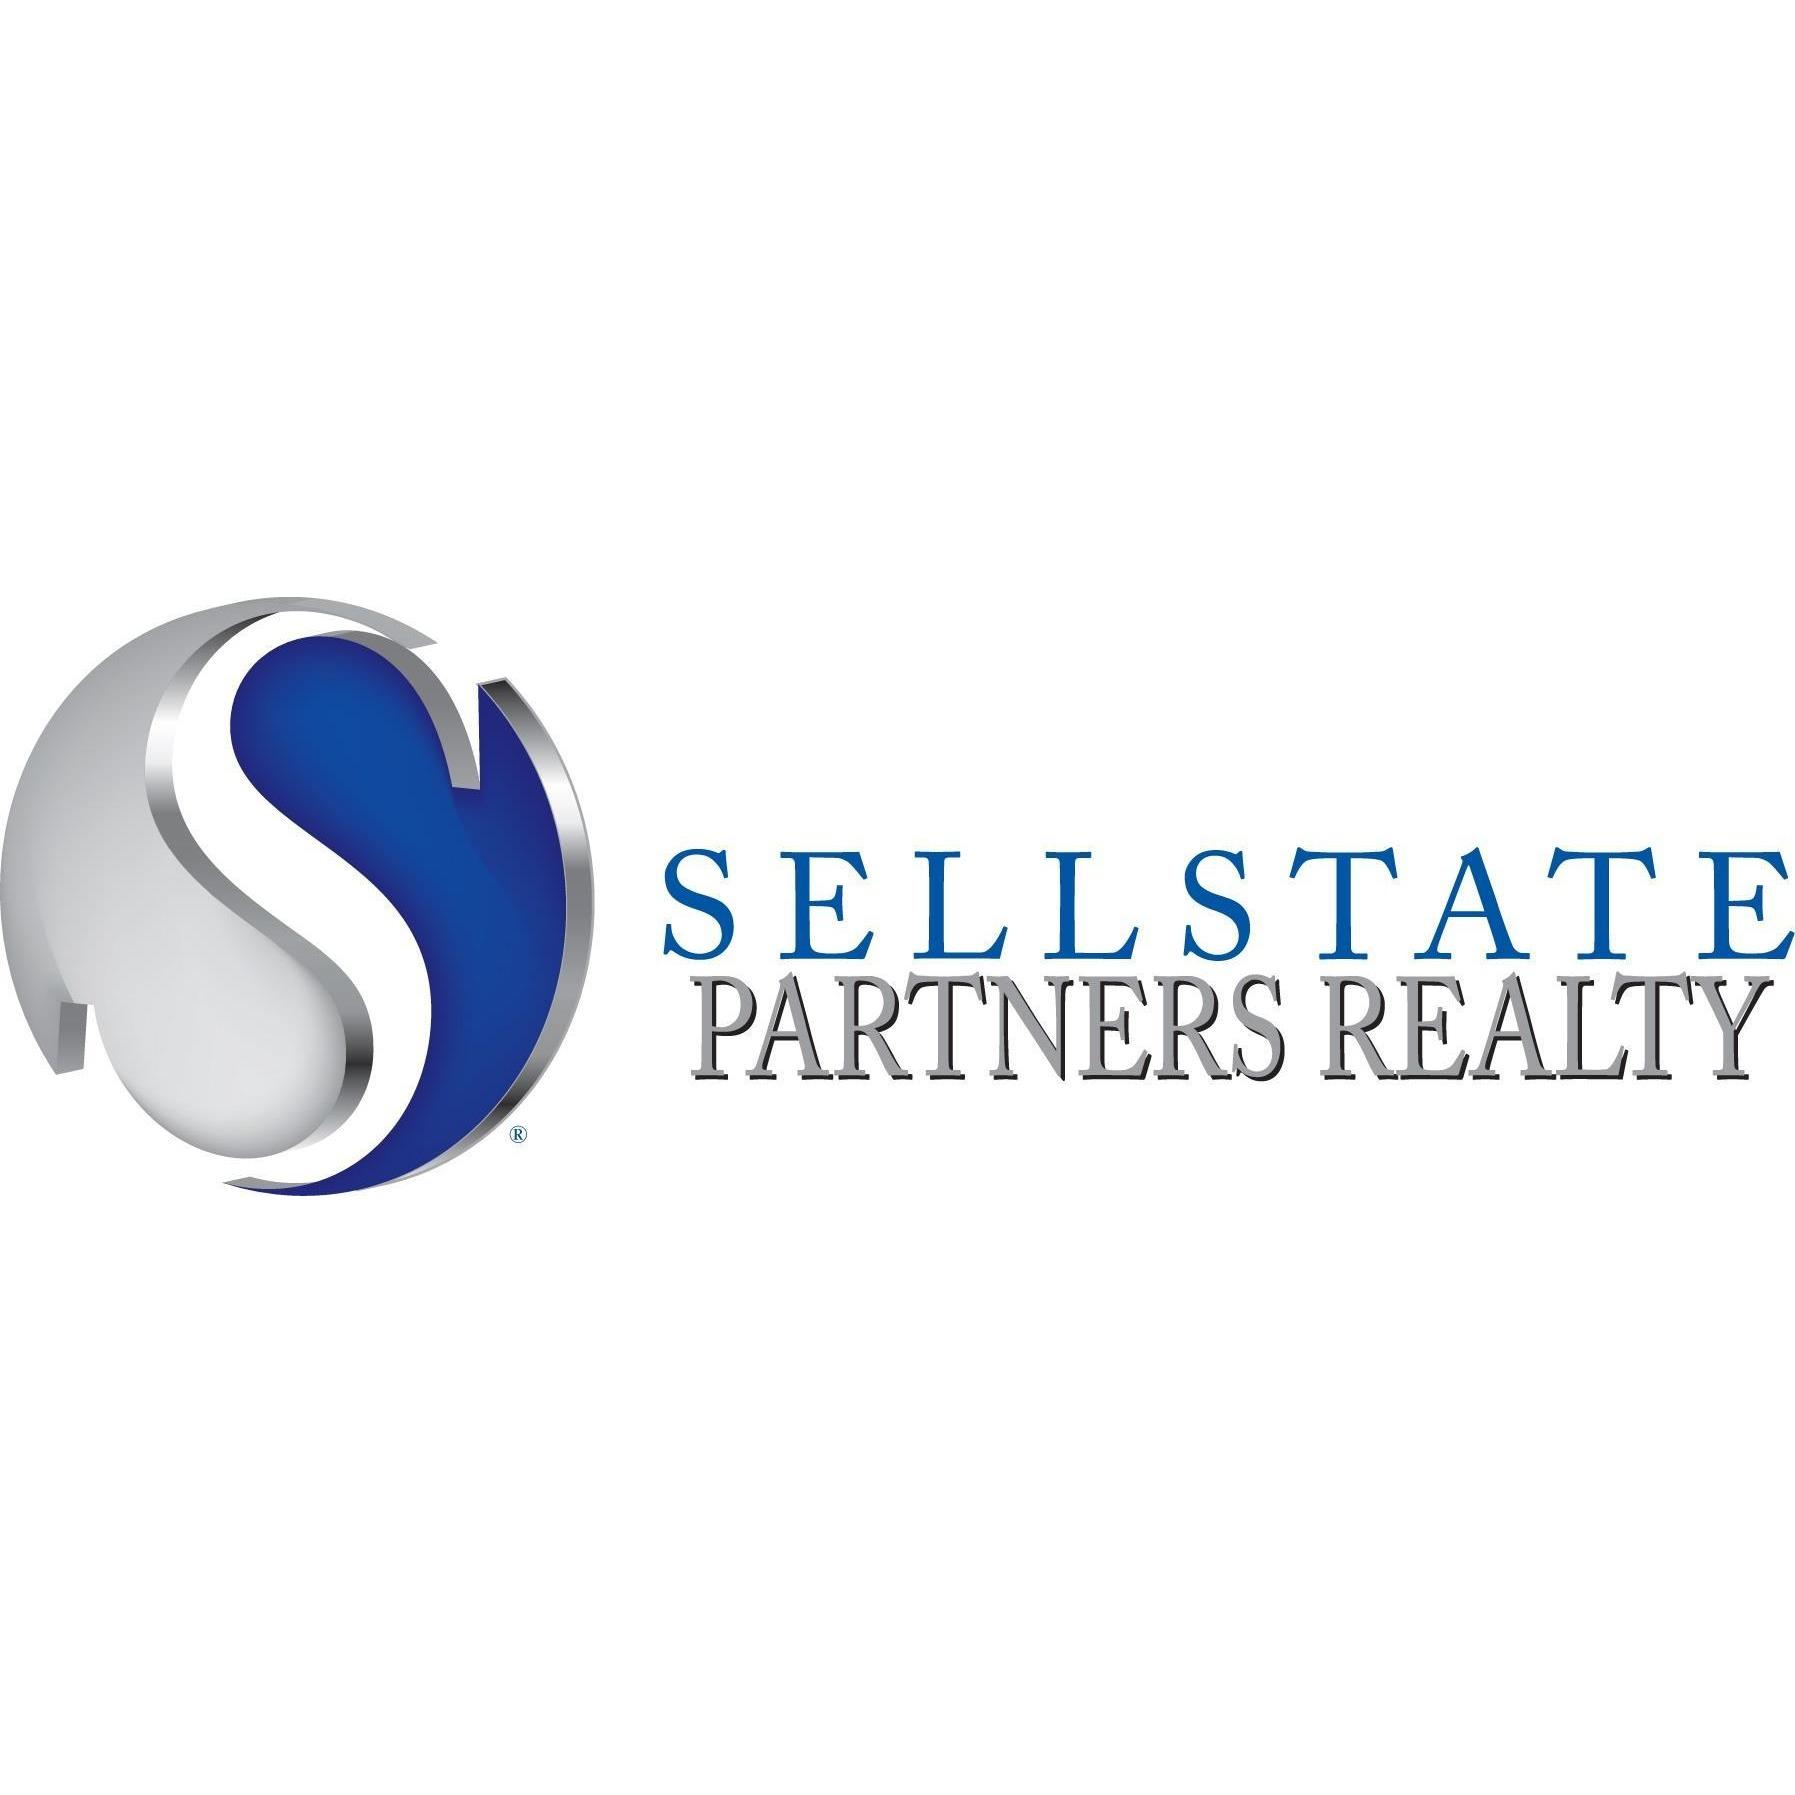 Schelo Doirin   The Investor's Realtor